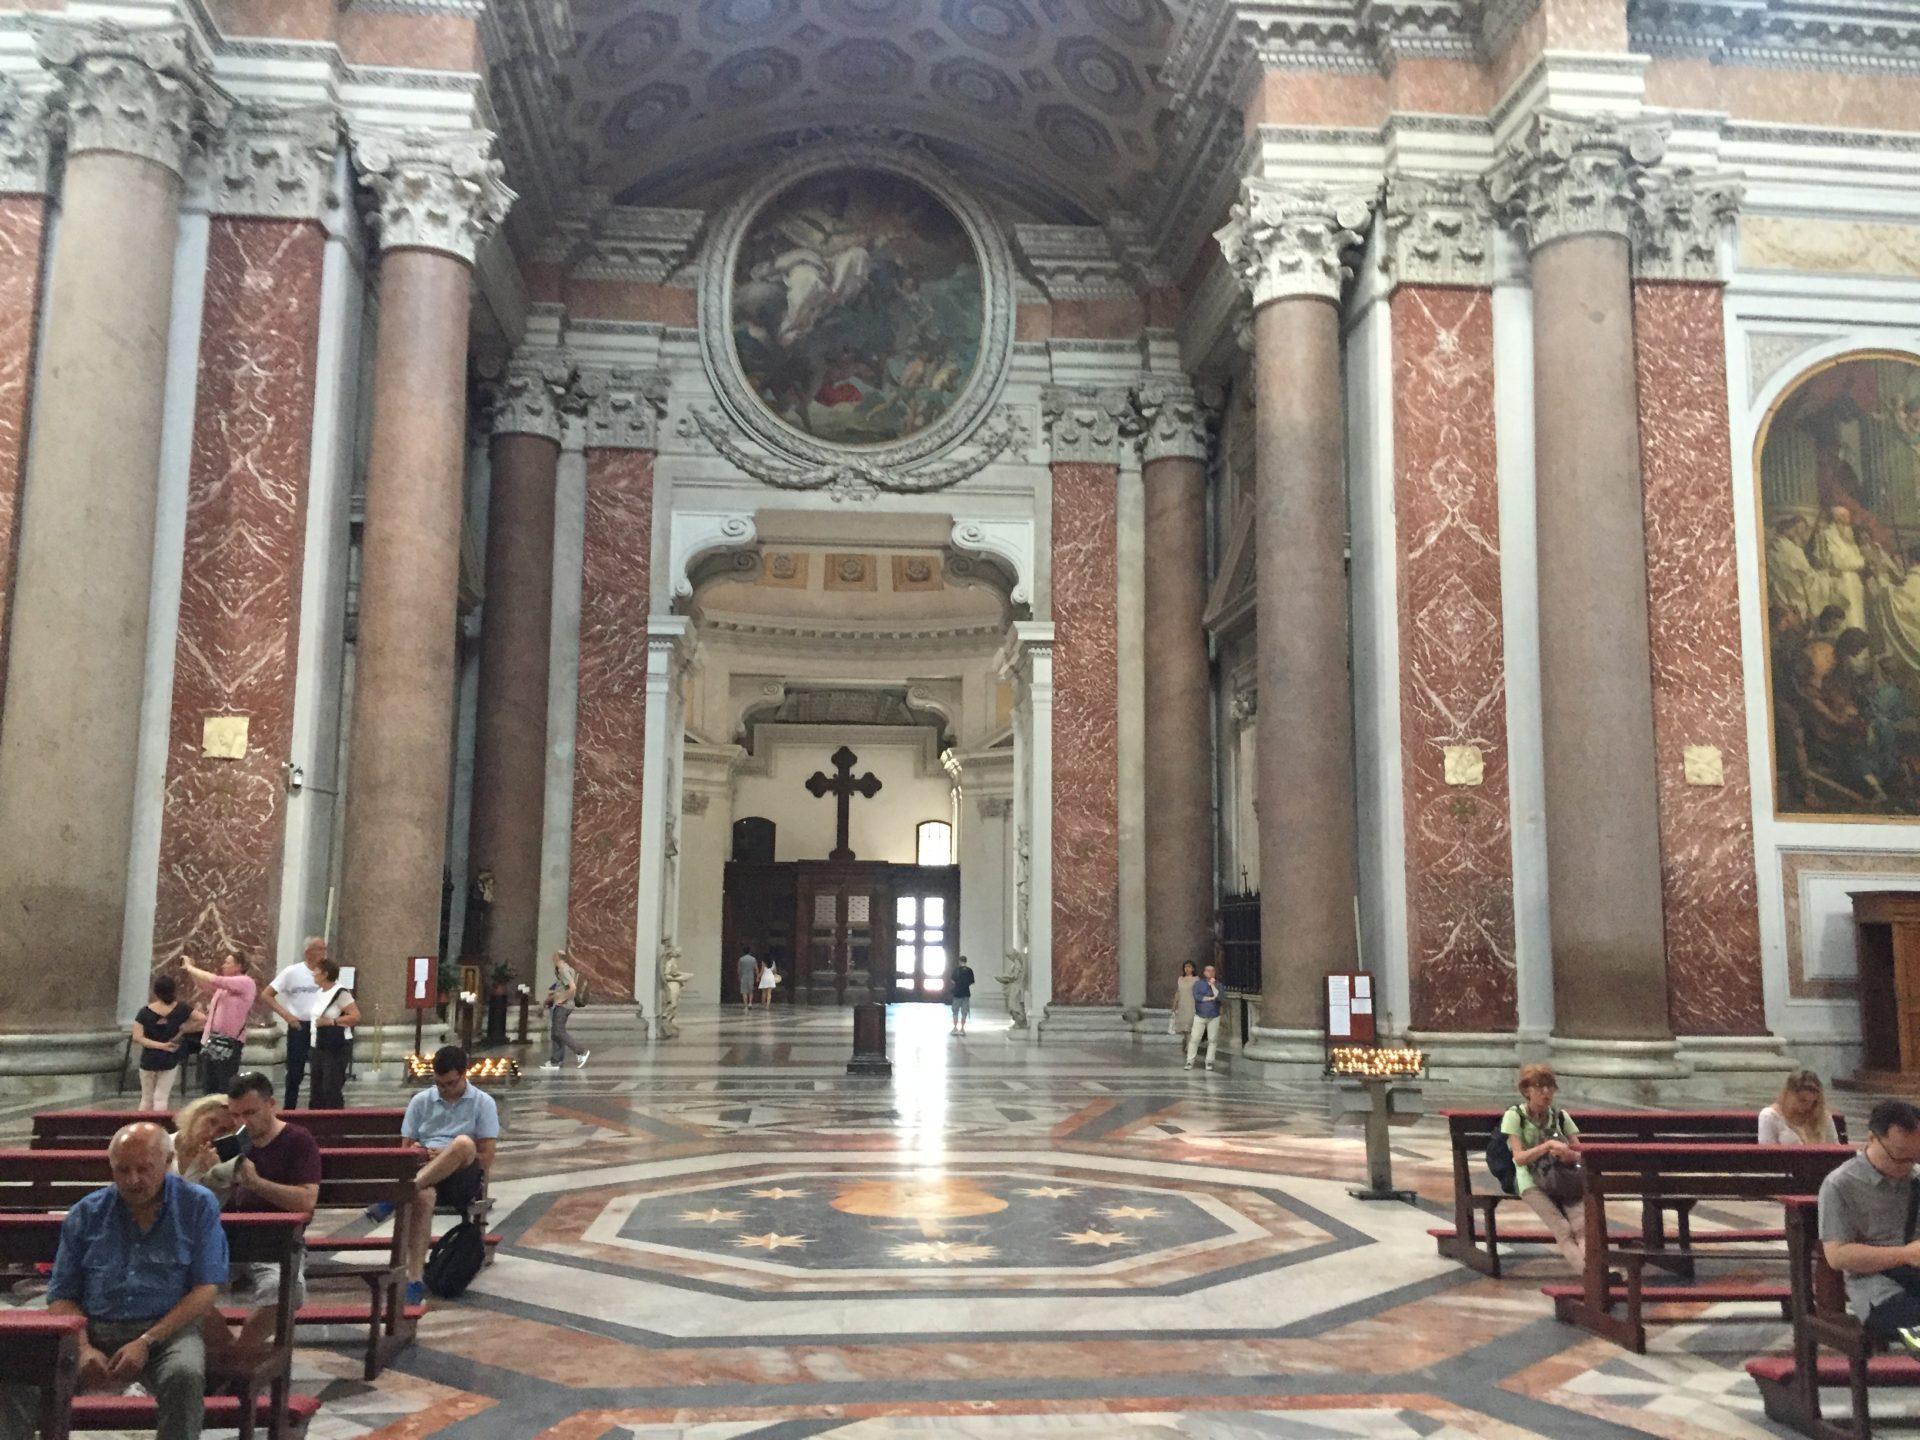 "<img src=""http://marenostrum.pl/wp-content/uploads//2019/11/Santa-Maria-degli-Angeli-et-dei-Martiri-3.jpeg"" alt=""Santa Maria degli Angeli et dei Martiri w Rzymie"" />"